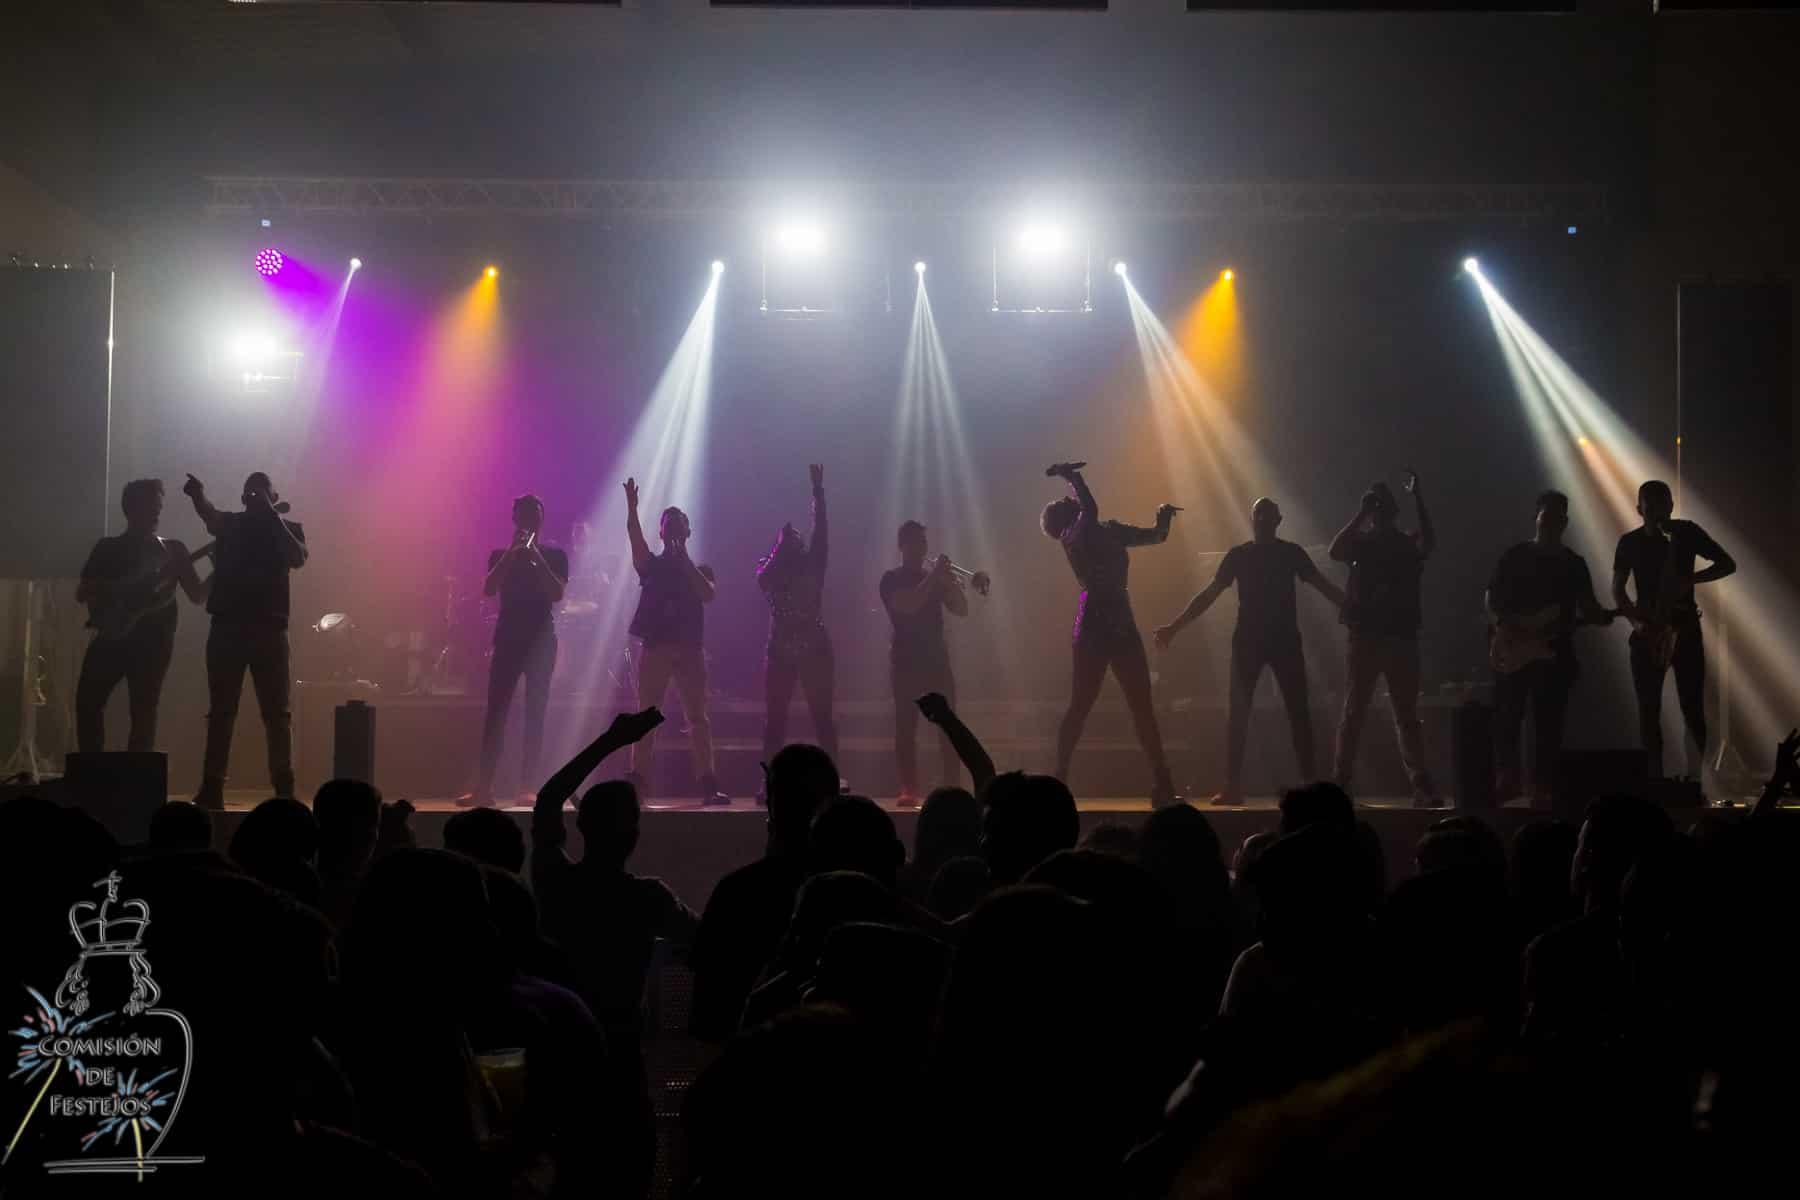 orquesta formula show en la almunia